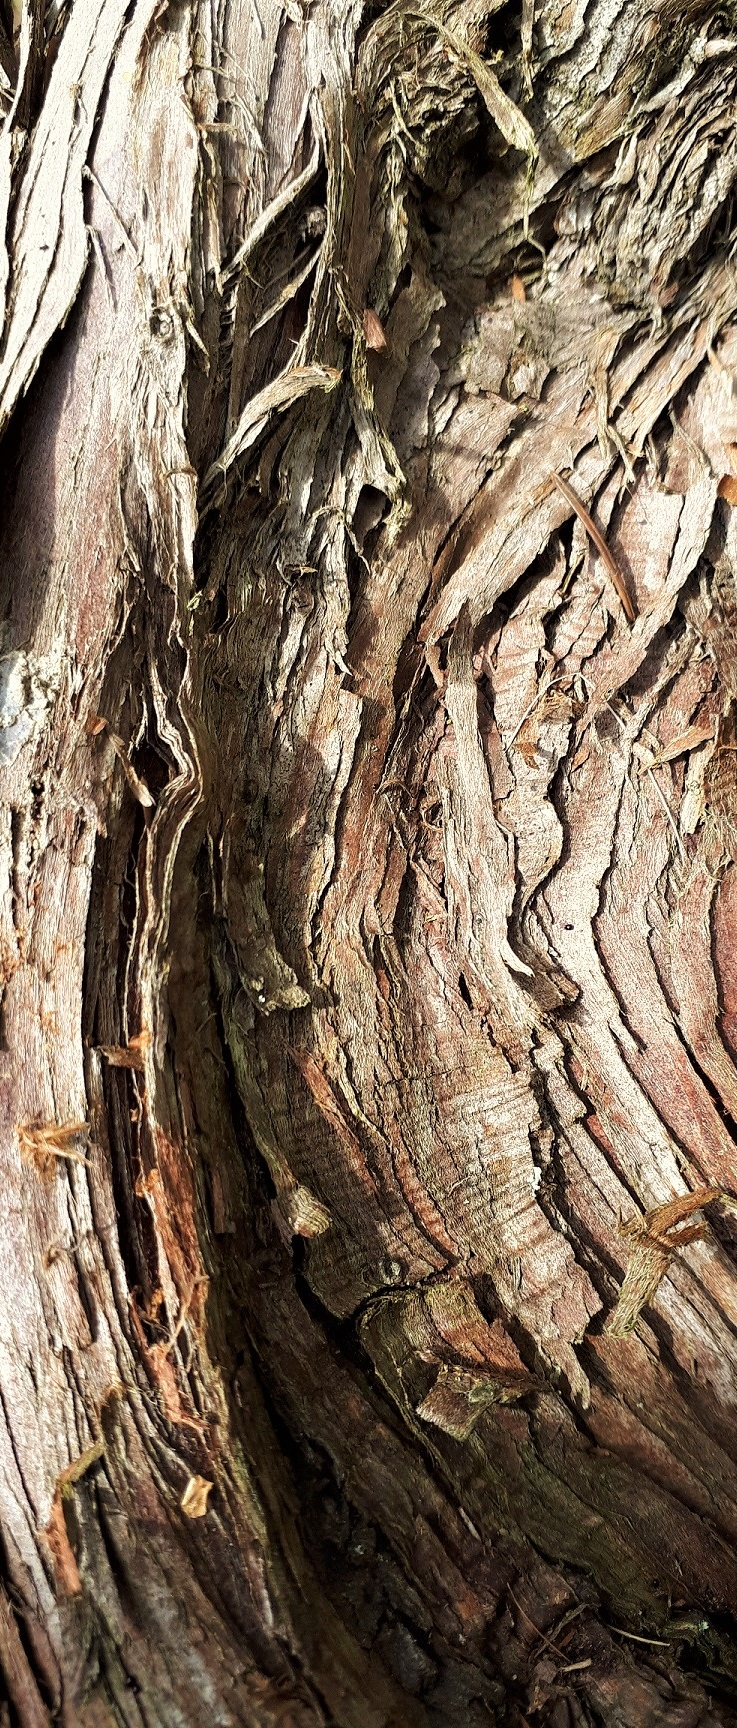 WACHOLDER (Juniperus communis) - Rinde.